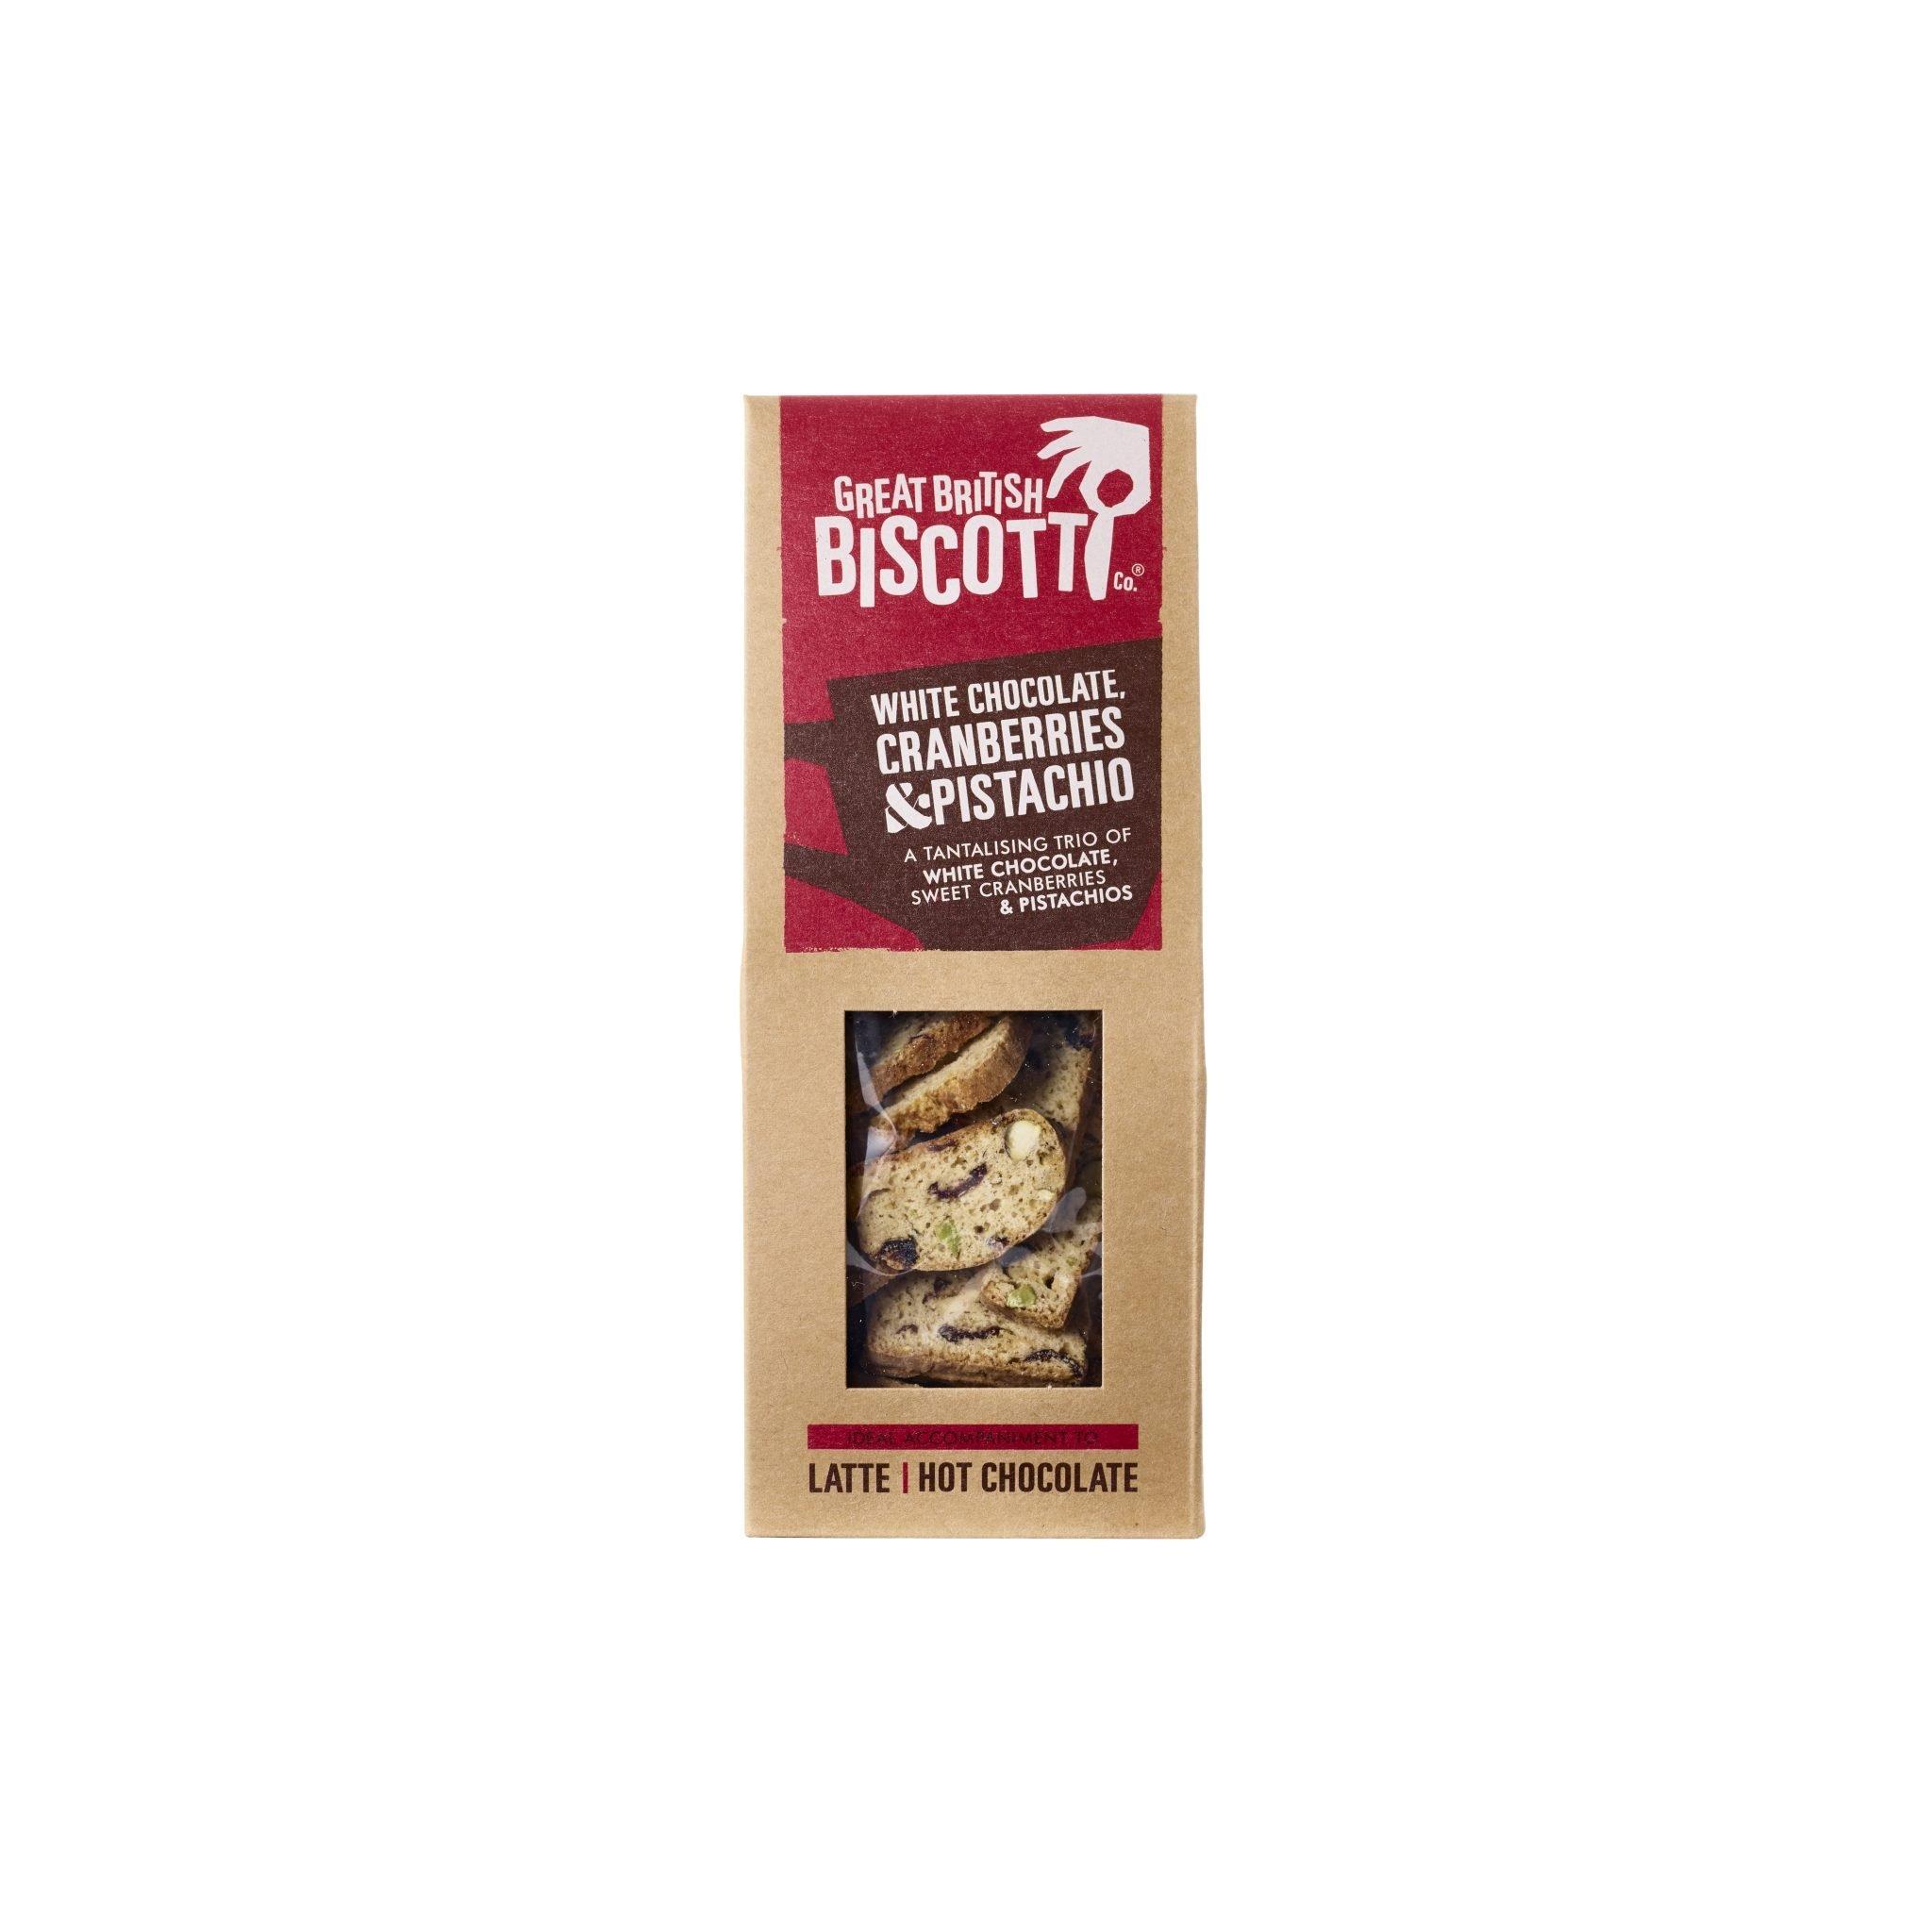 Great British Biscotti White Chocolate, Cranberry & Pistachio